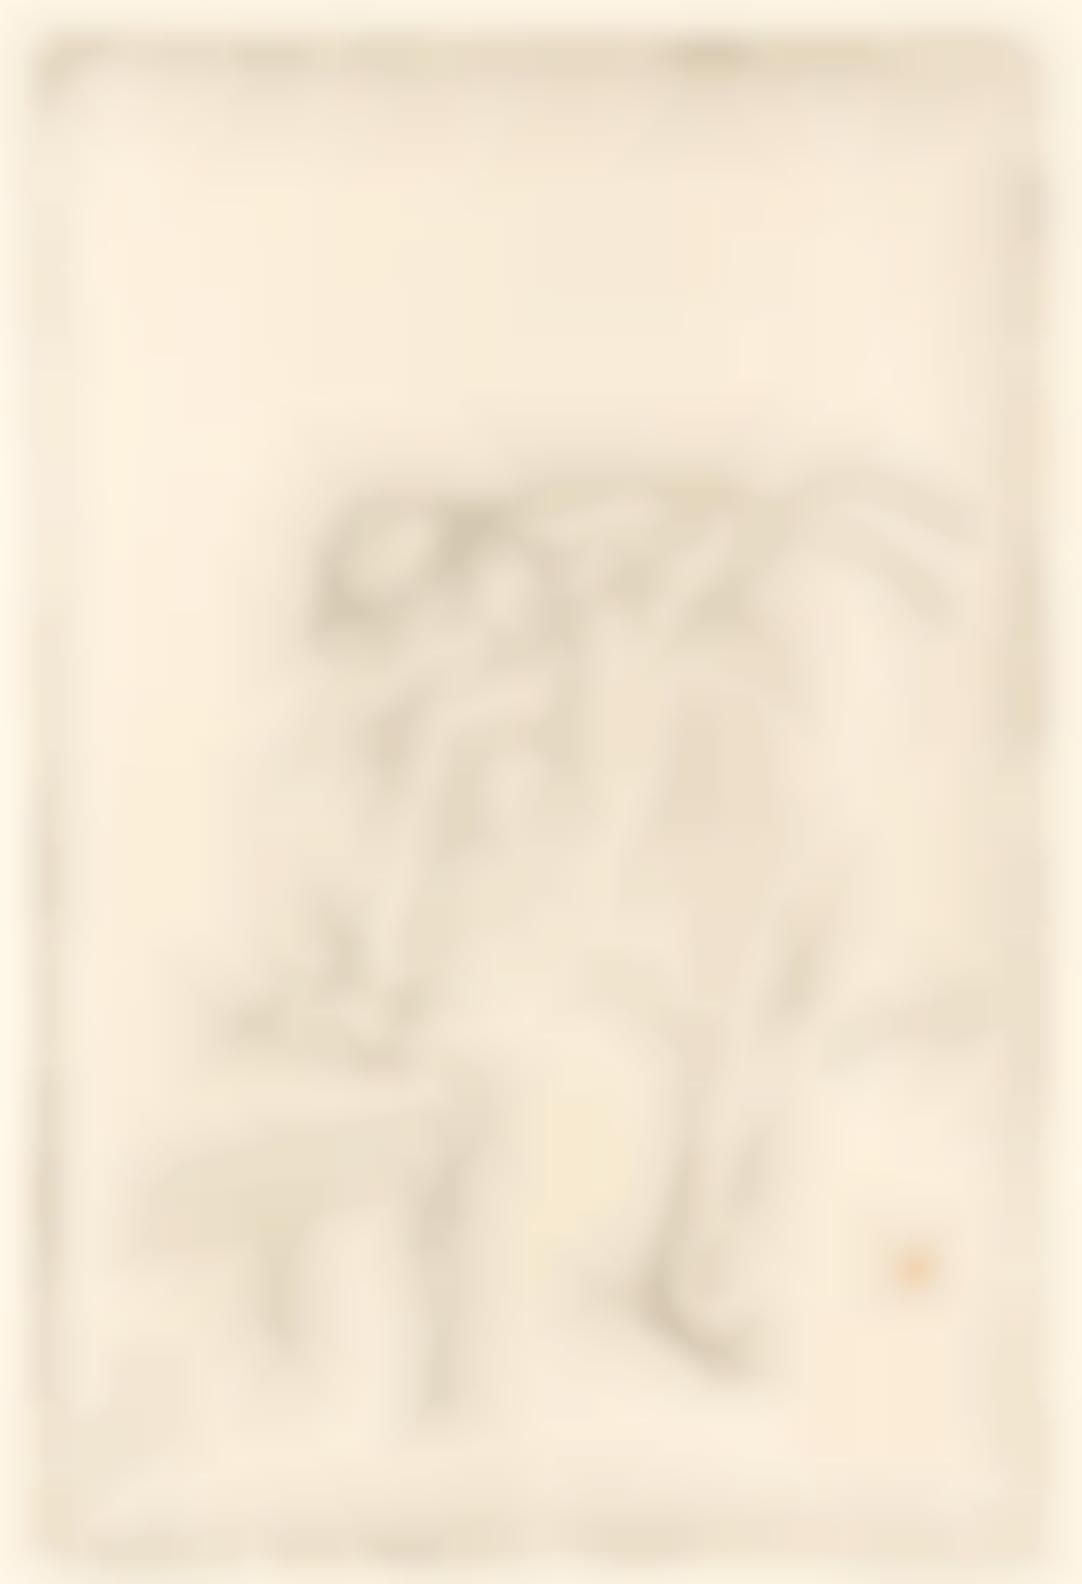 Edgar Degas-Danseuse Mettant Son Chausson (Delteil 36; Adhemar 60; Reed & Shapiro 55); a Rade (Paysage de Grece) (D.10; A.1; R.&S.1;)-1888